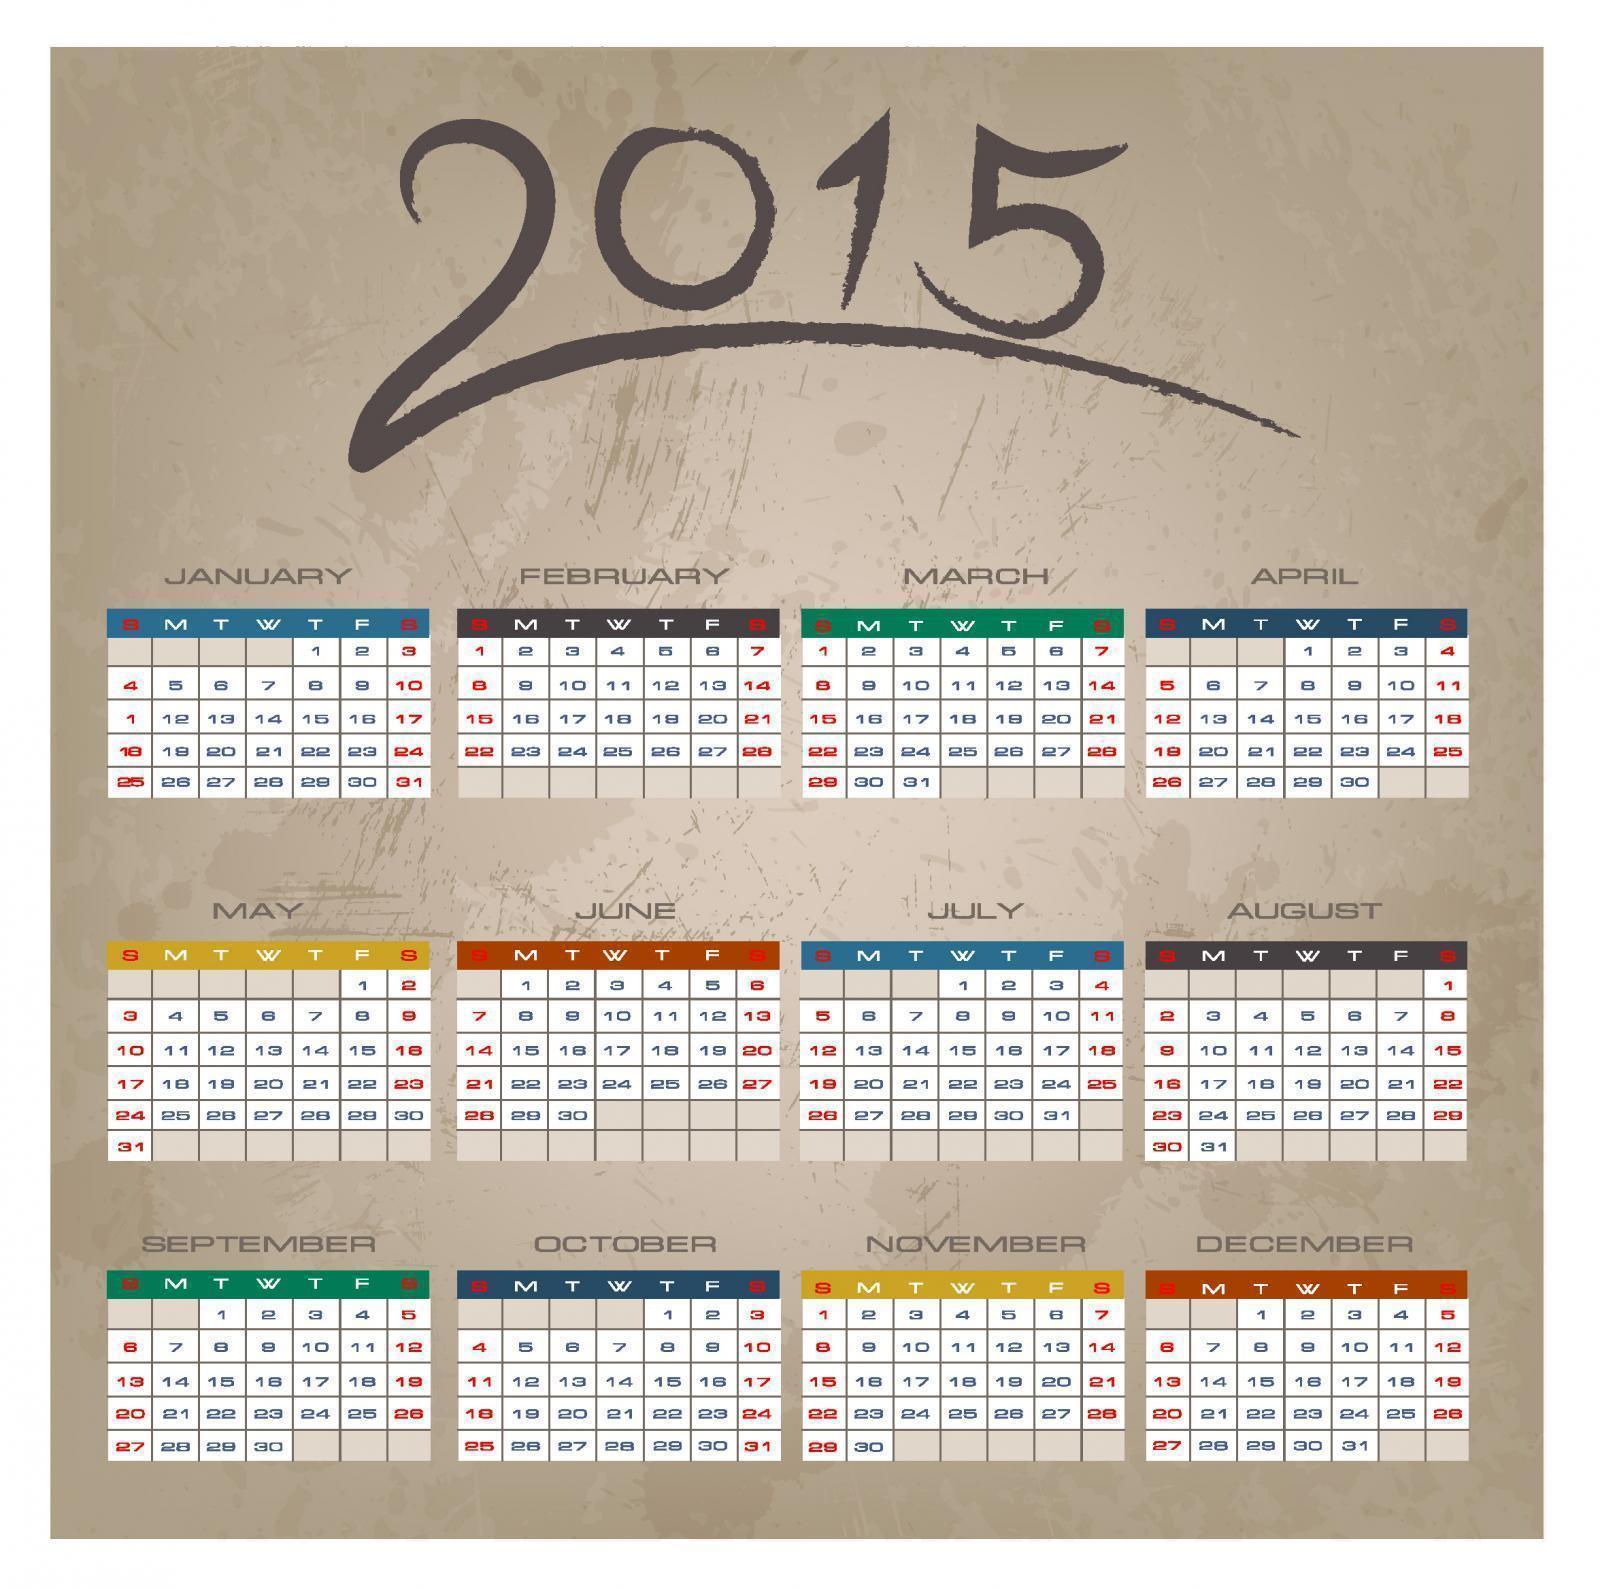 Calendar Wallpaper For Mac : Playboy mac wallpapers wallpaper cave